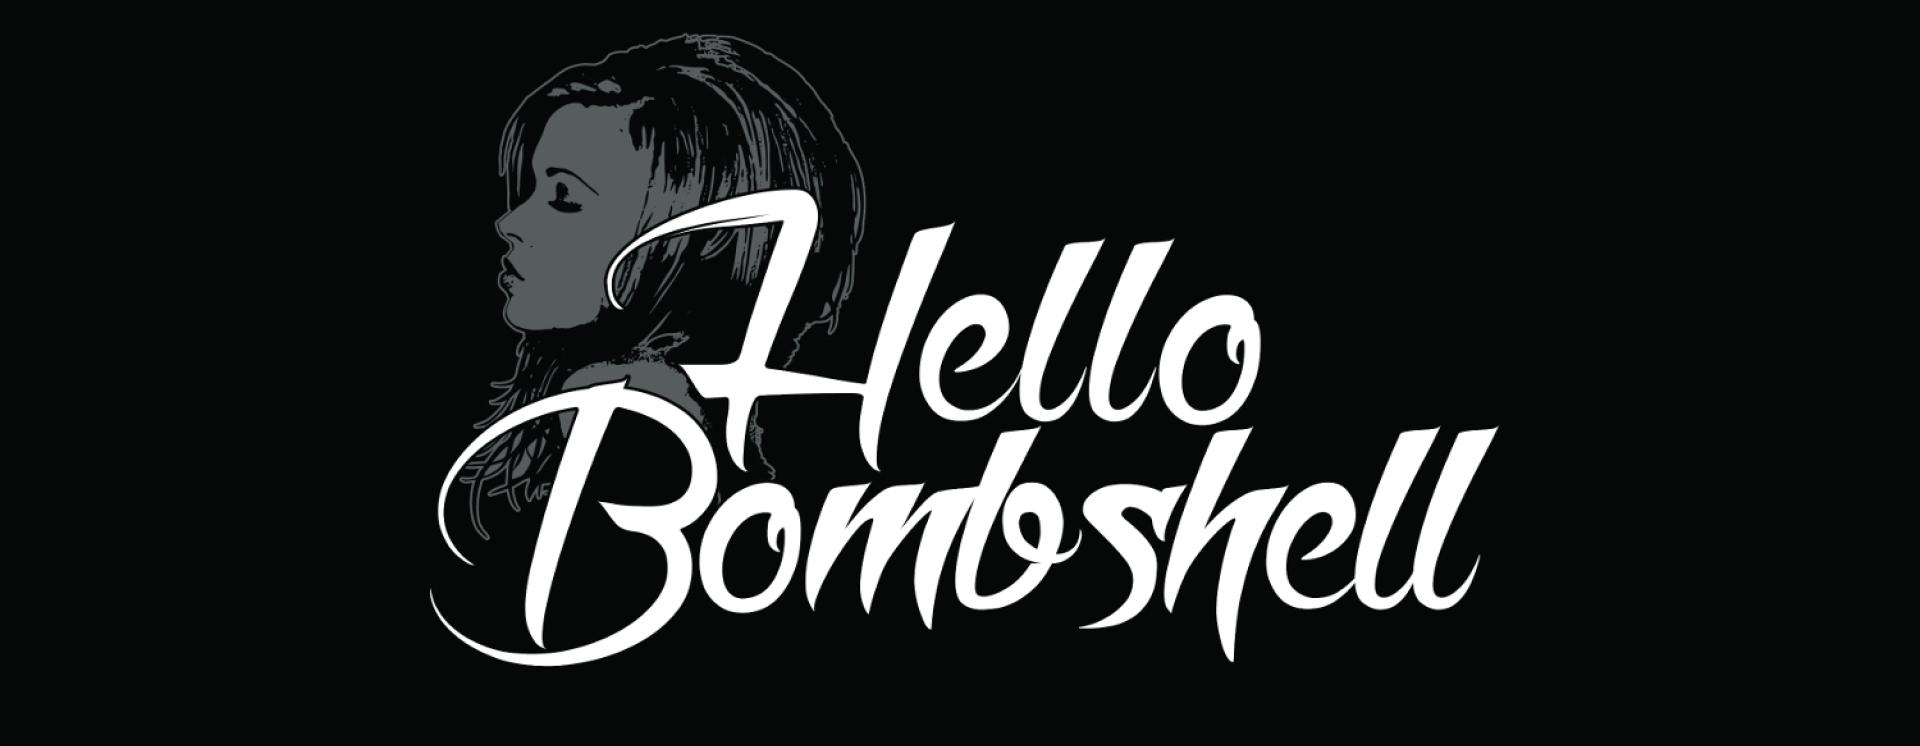 Hellobombshellinvert  2  copy